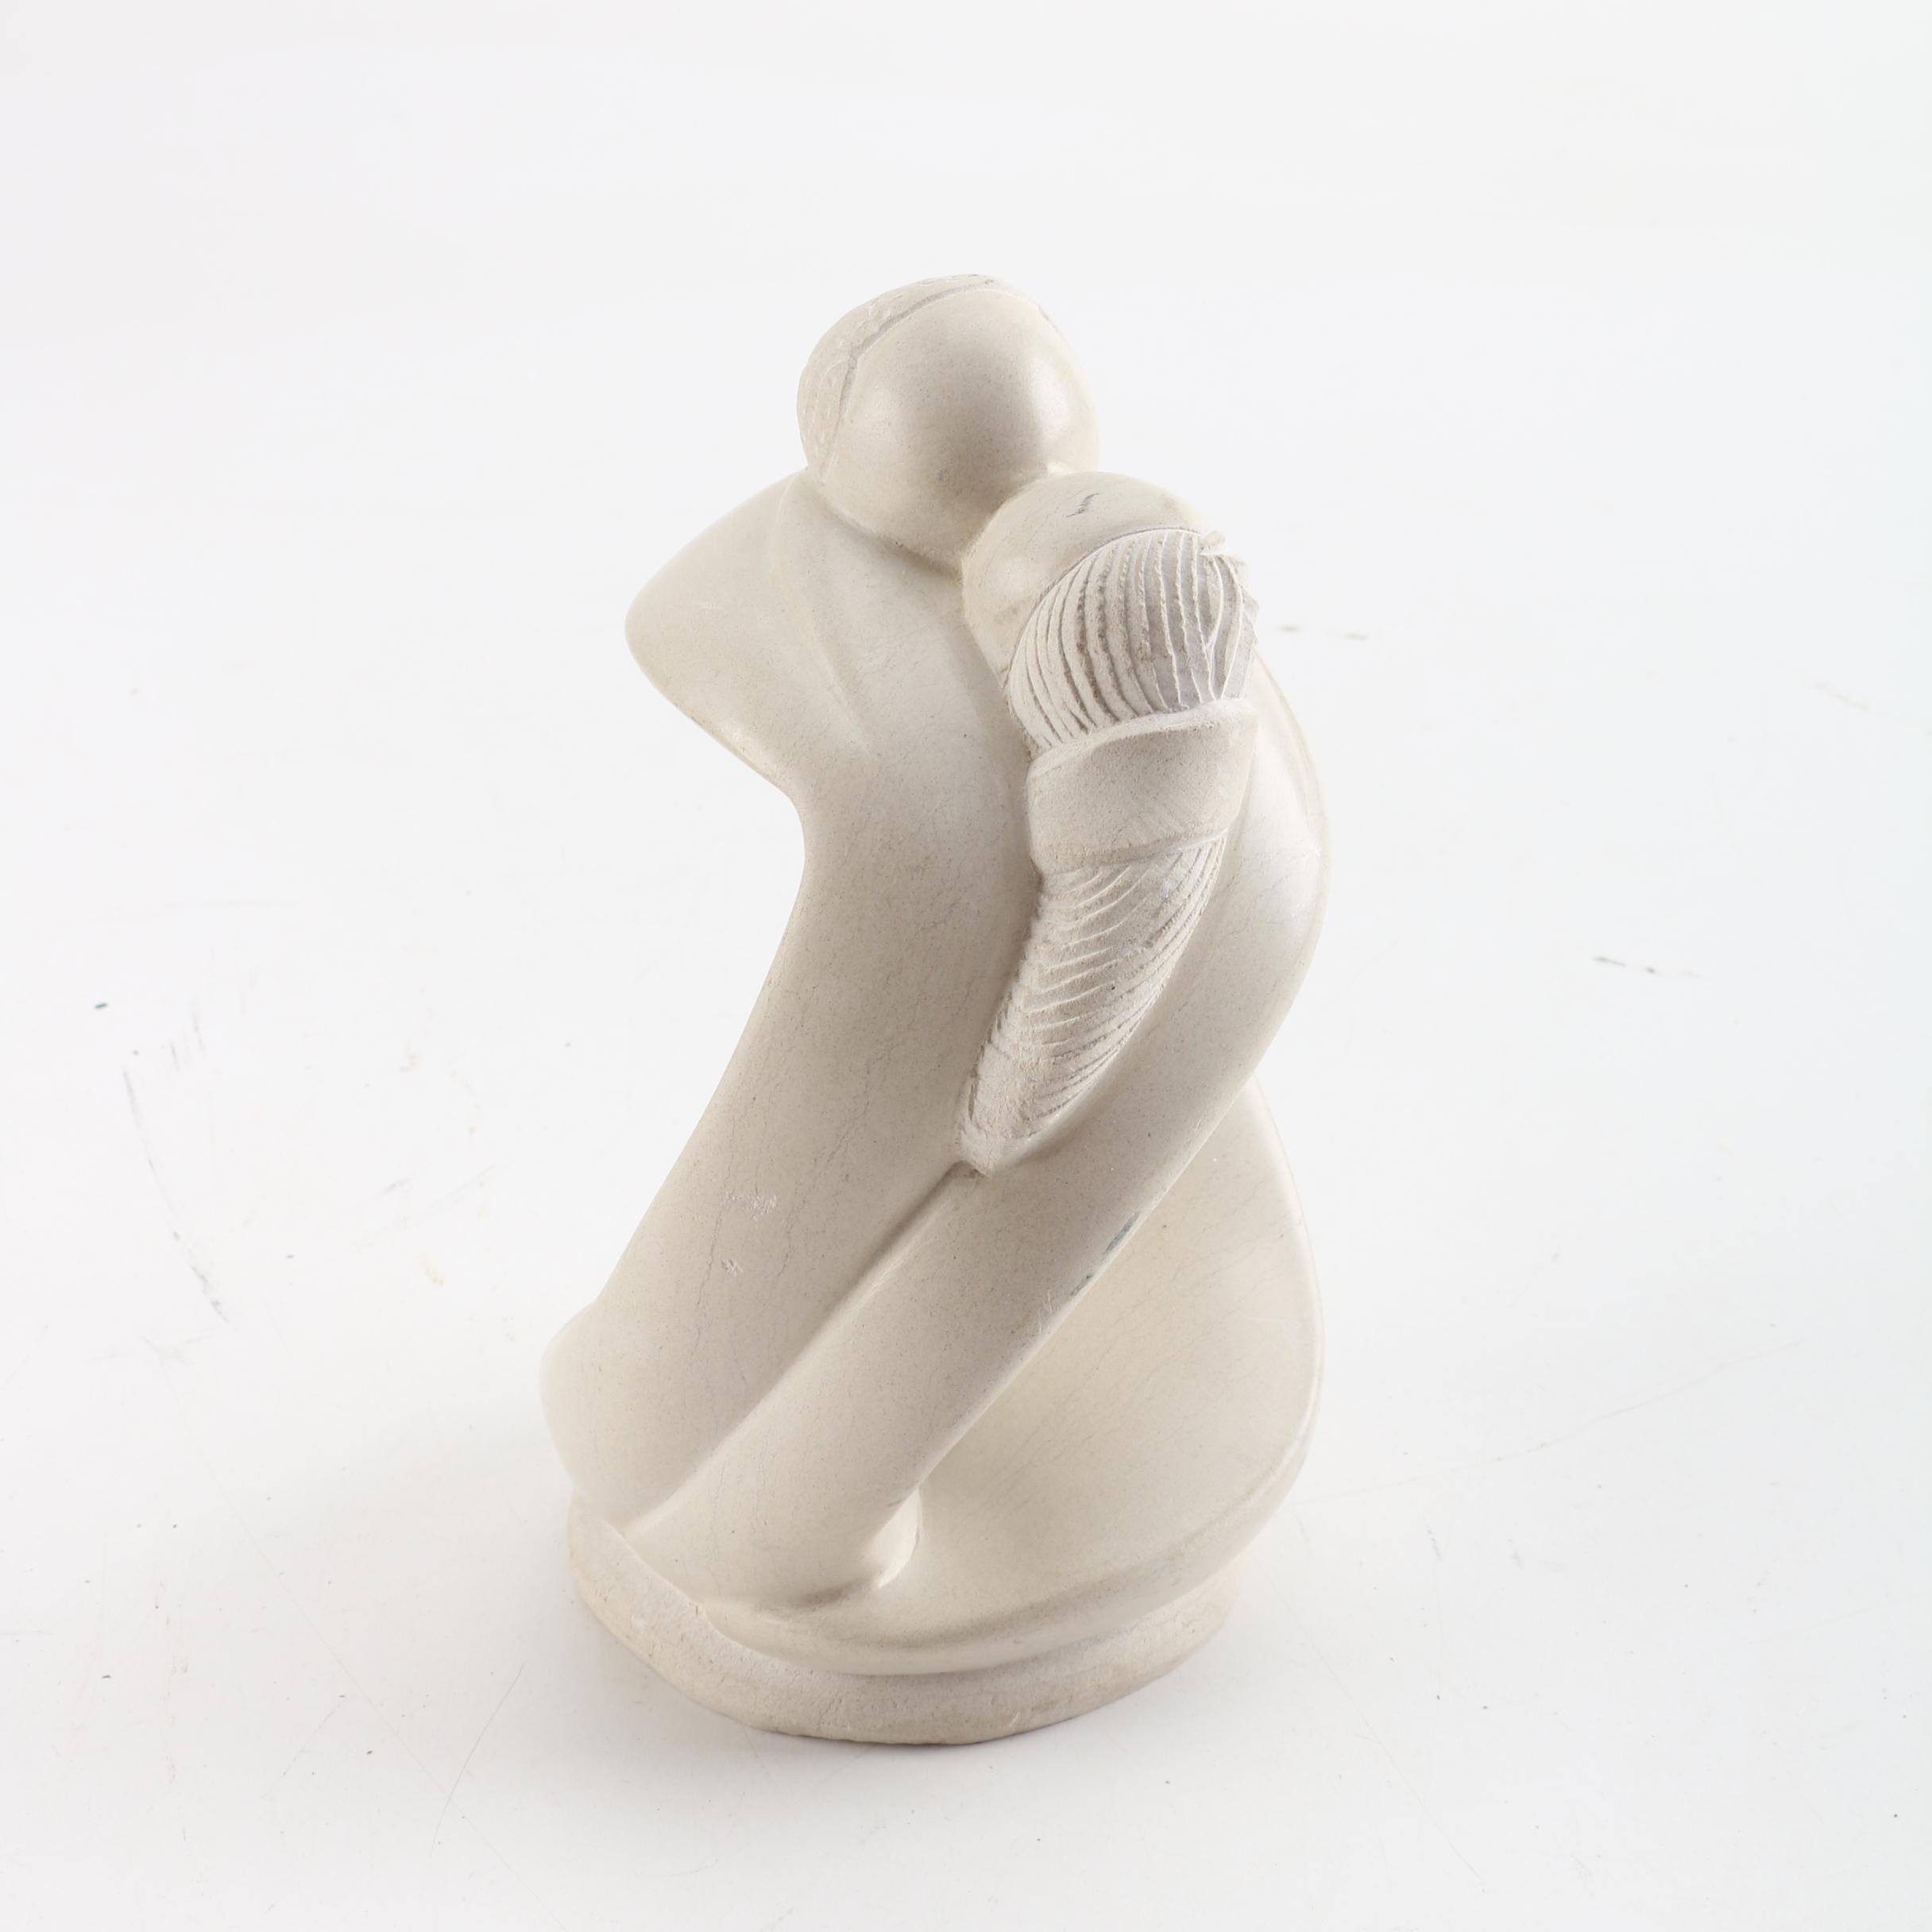 Carved Modernistic Soapstone Figurine